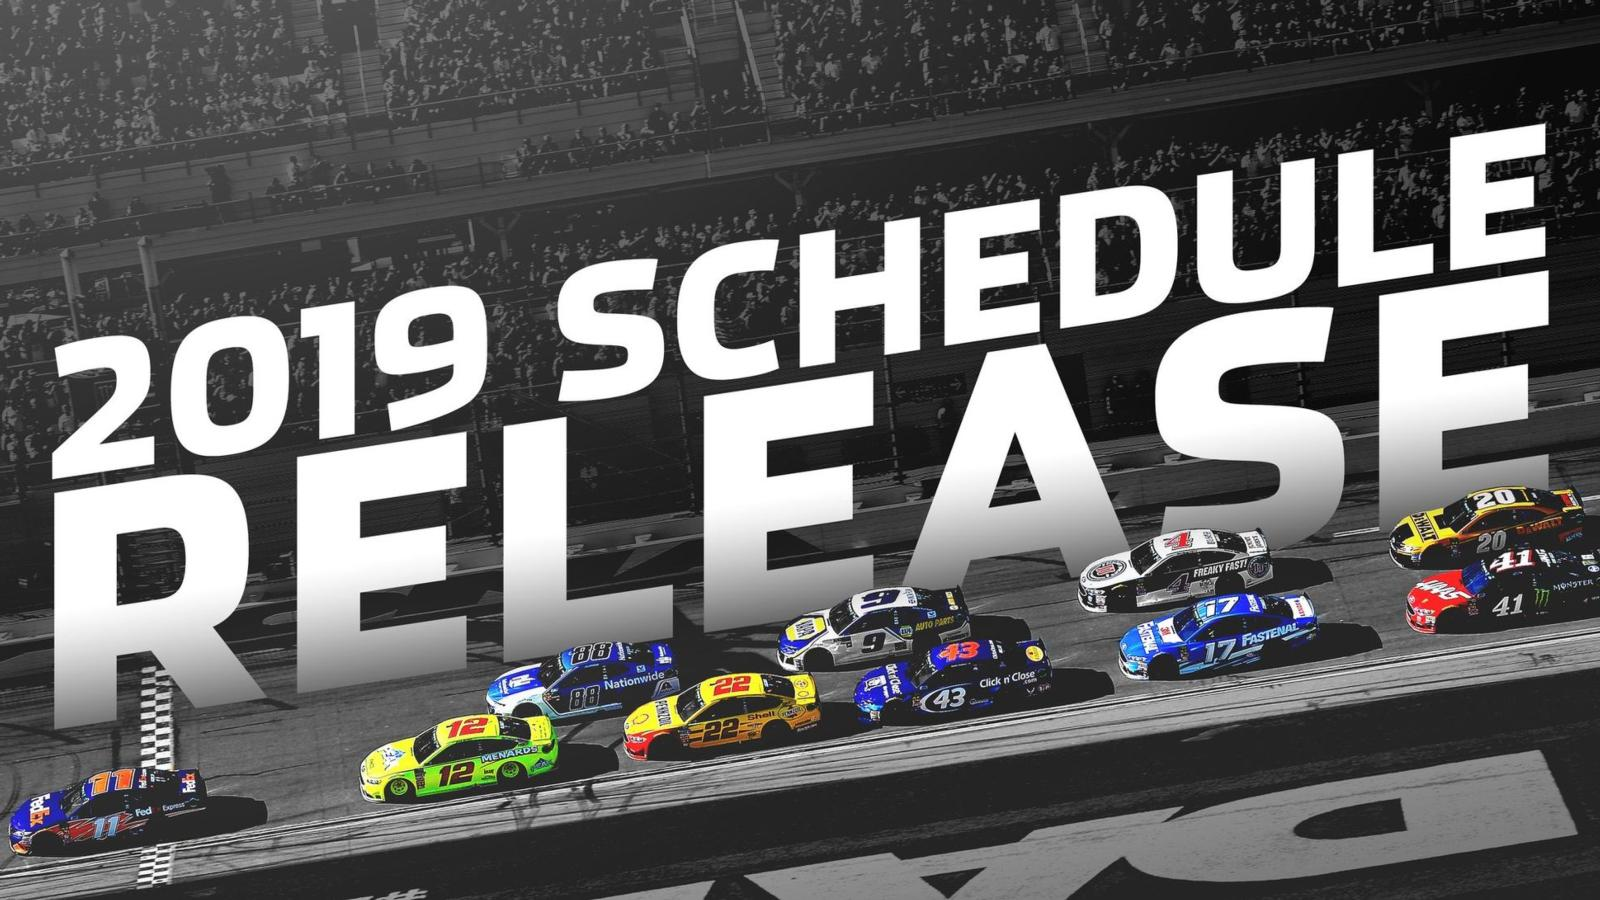 2019 Monster Energy Nascar Schedule Revealed Quaker State 400 Set